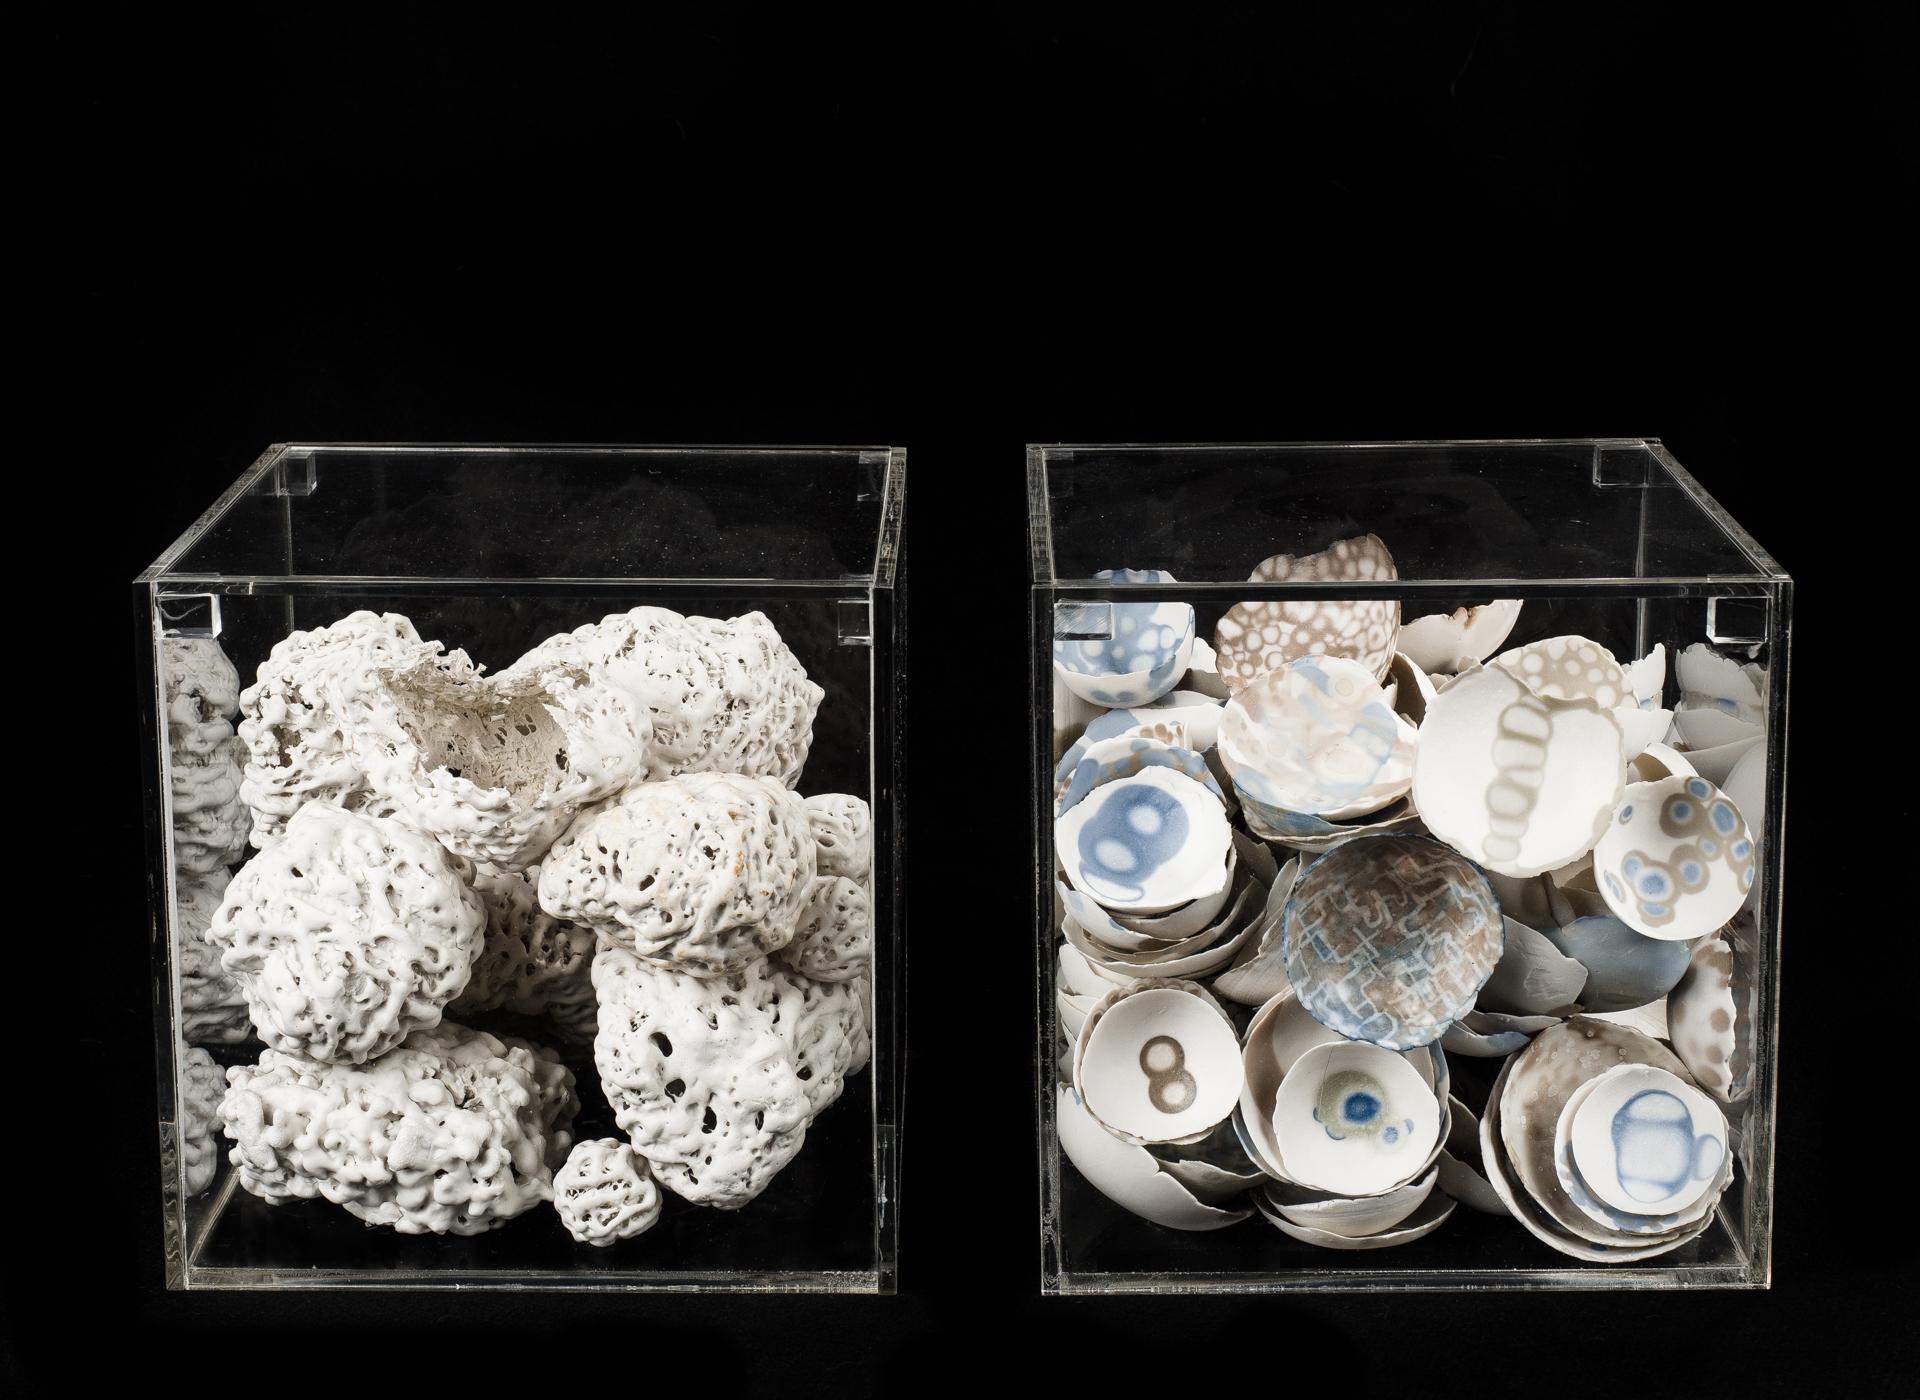 Porcelain, metallic salts, organic materials, plexiglass - 2017